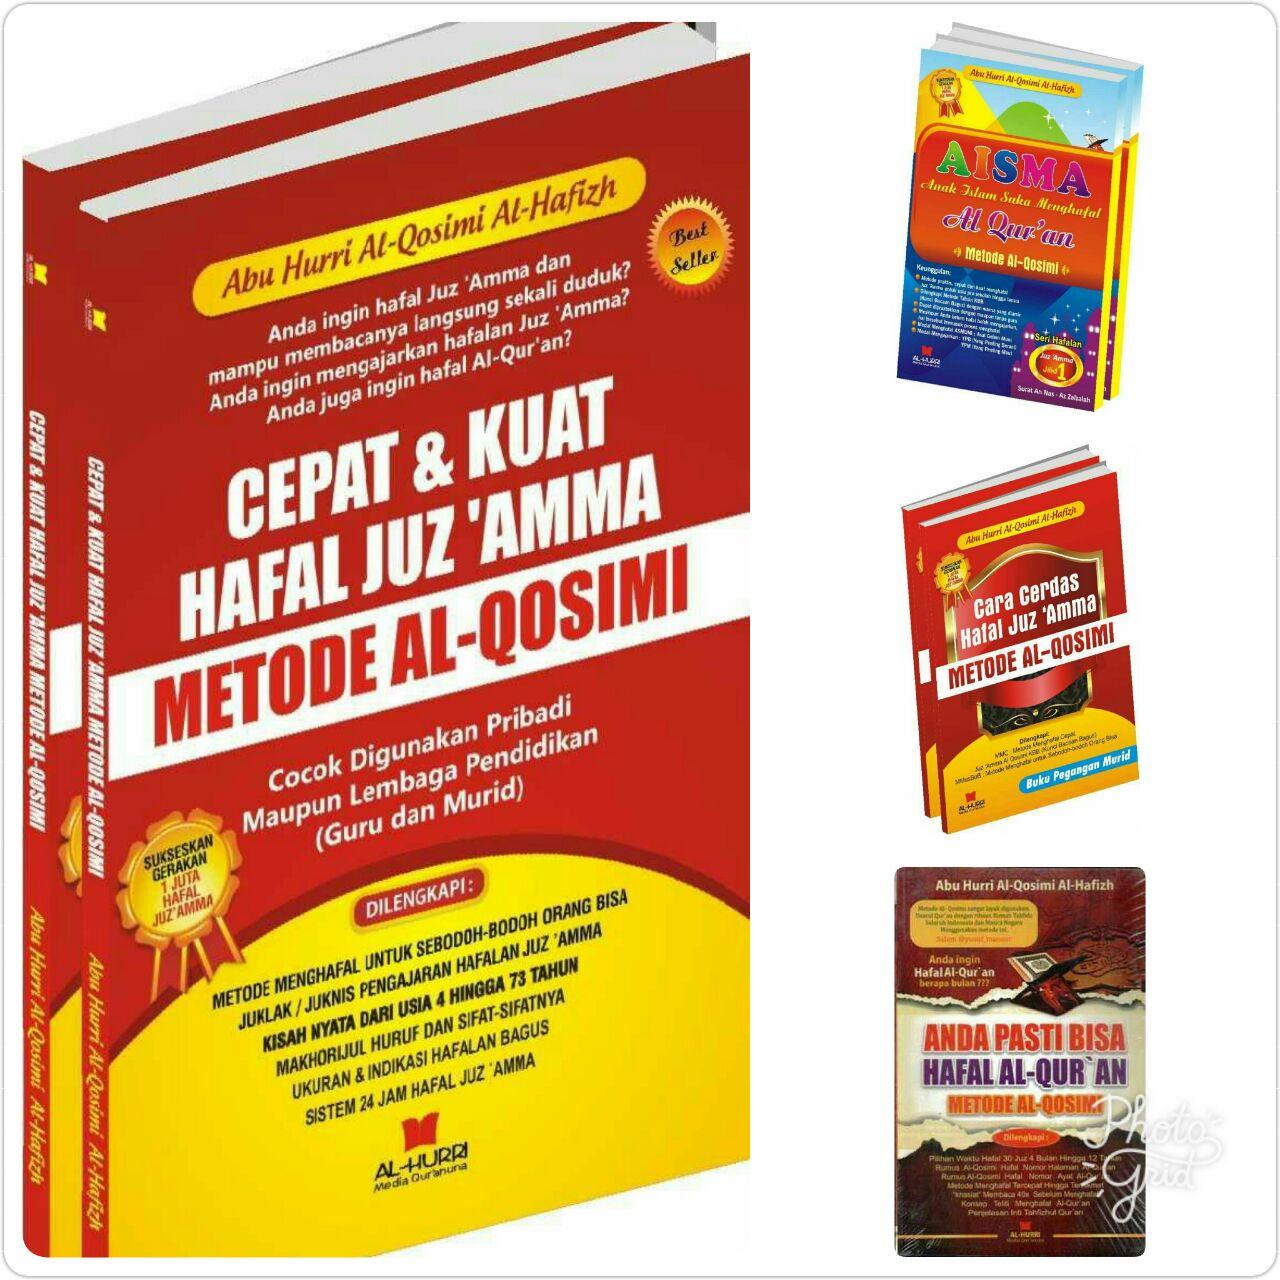 Metode Menghafal Al Qur'an